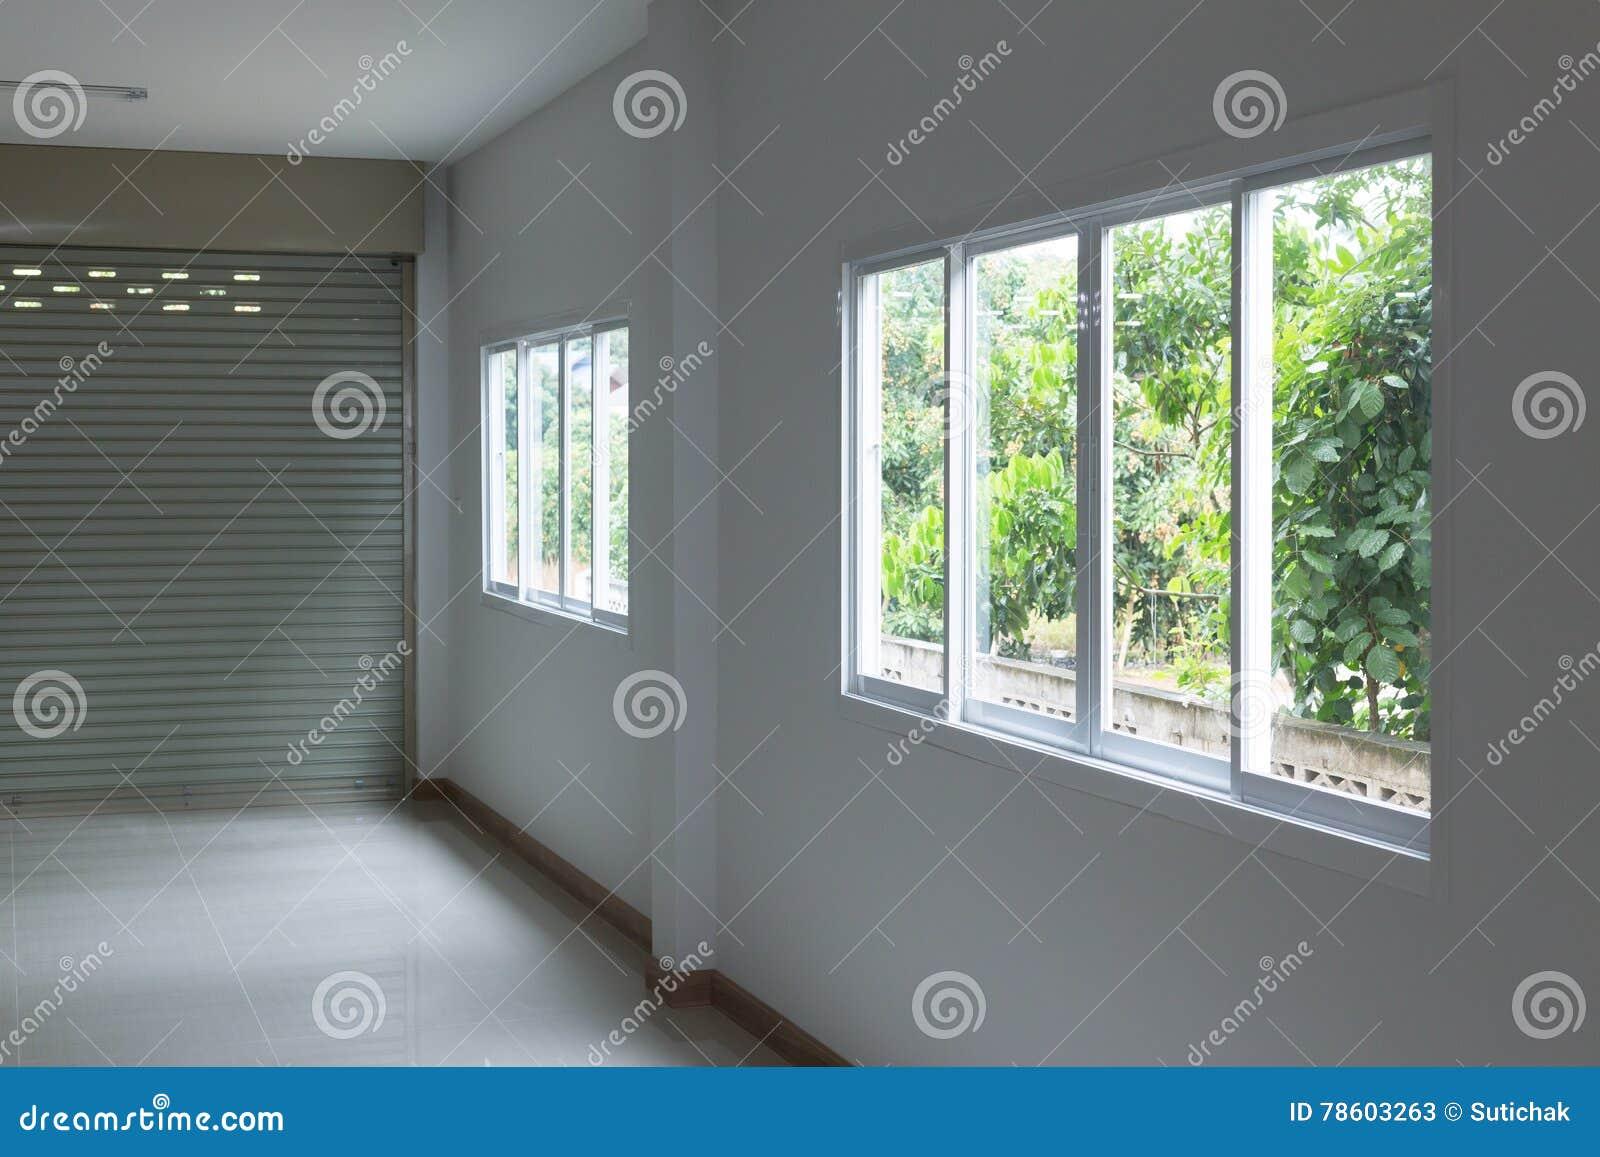 Glass Window Sliding On White Wall Interior